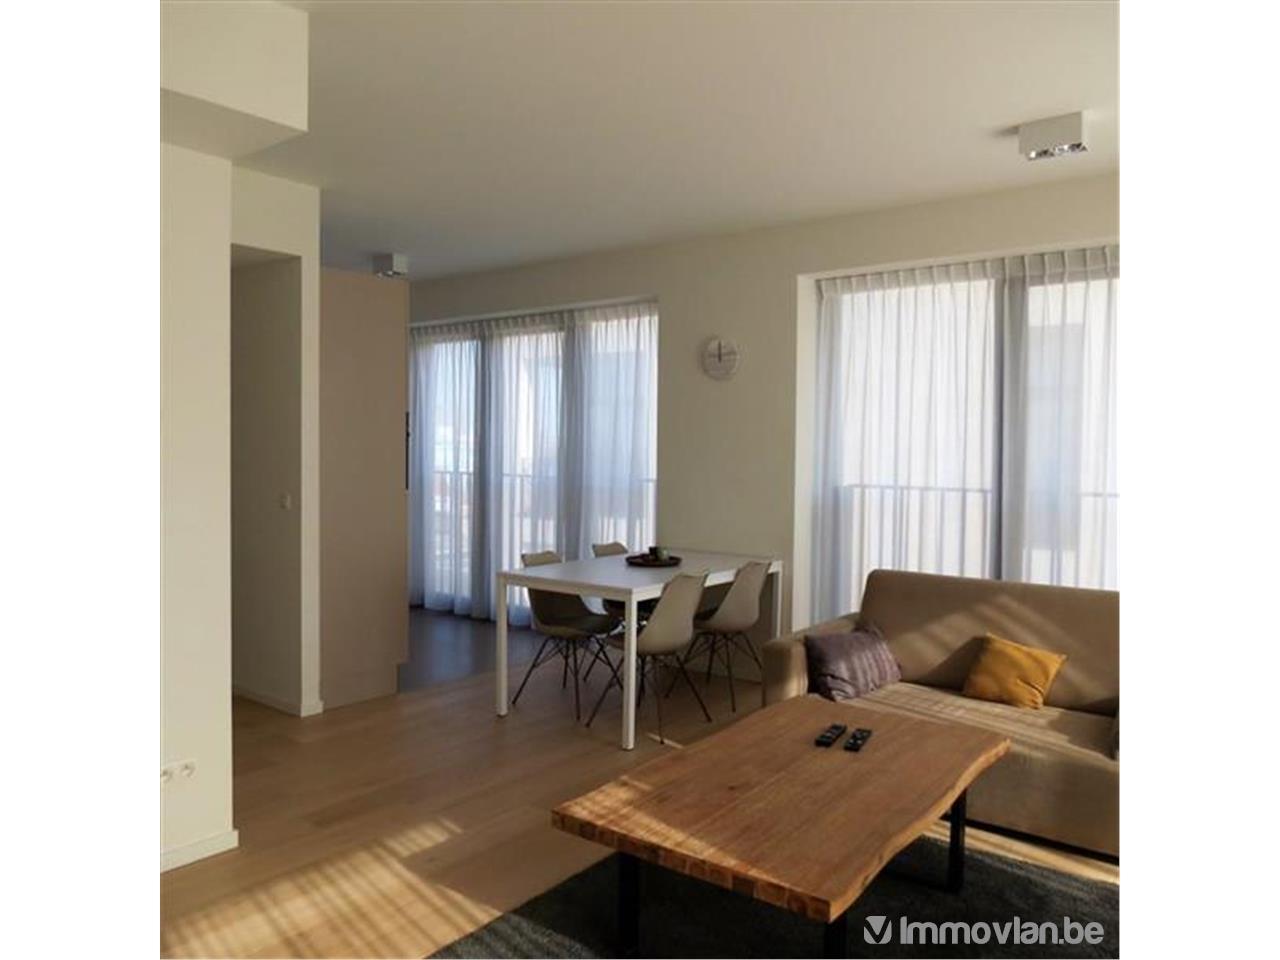 appartement rue d 39 argent 7 bruxelles vag83951. Black Bedroom Furniture Sets. Home Design Ideas